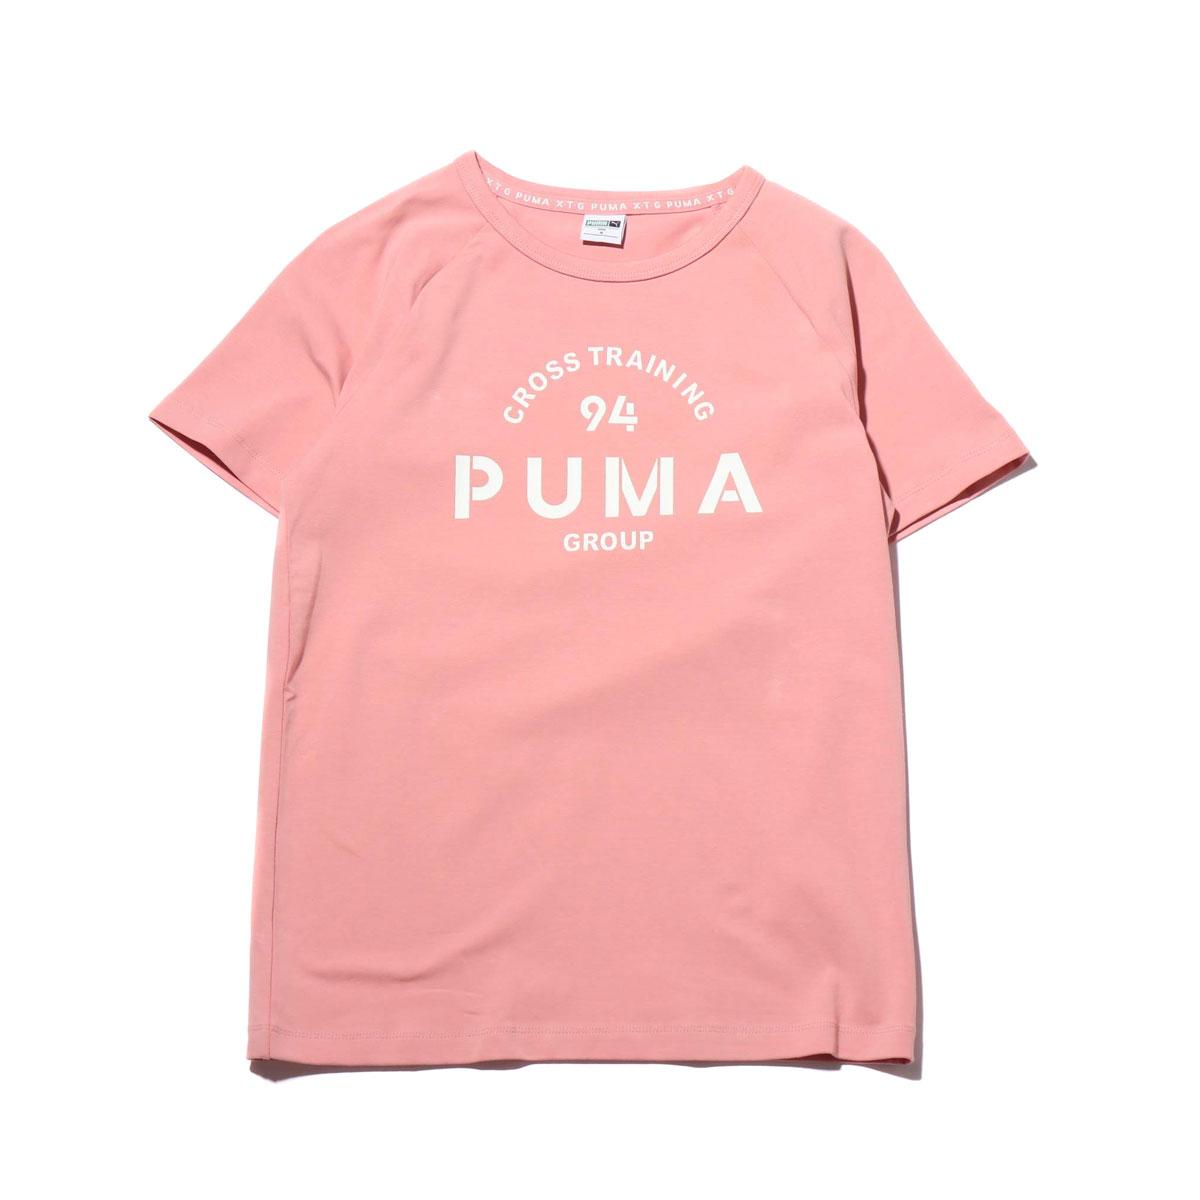 4db72853b5 PUMA XTG GRAPHIC SS TEE (BRIDAL ROSE) (Puma XTG graphic short sleeve  T-shirt)